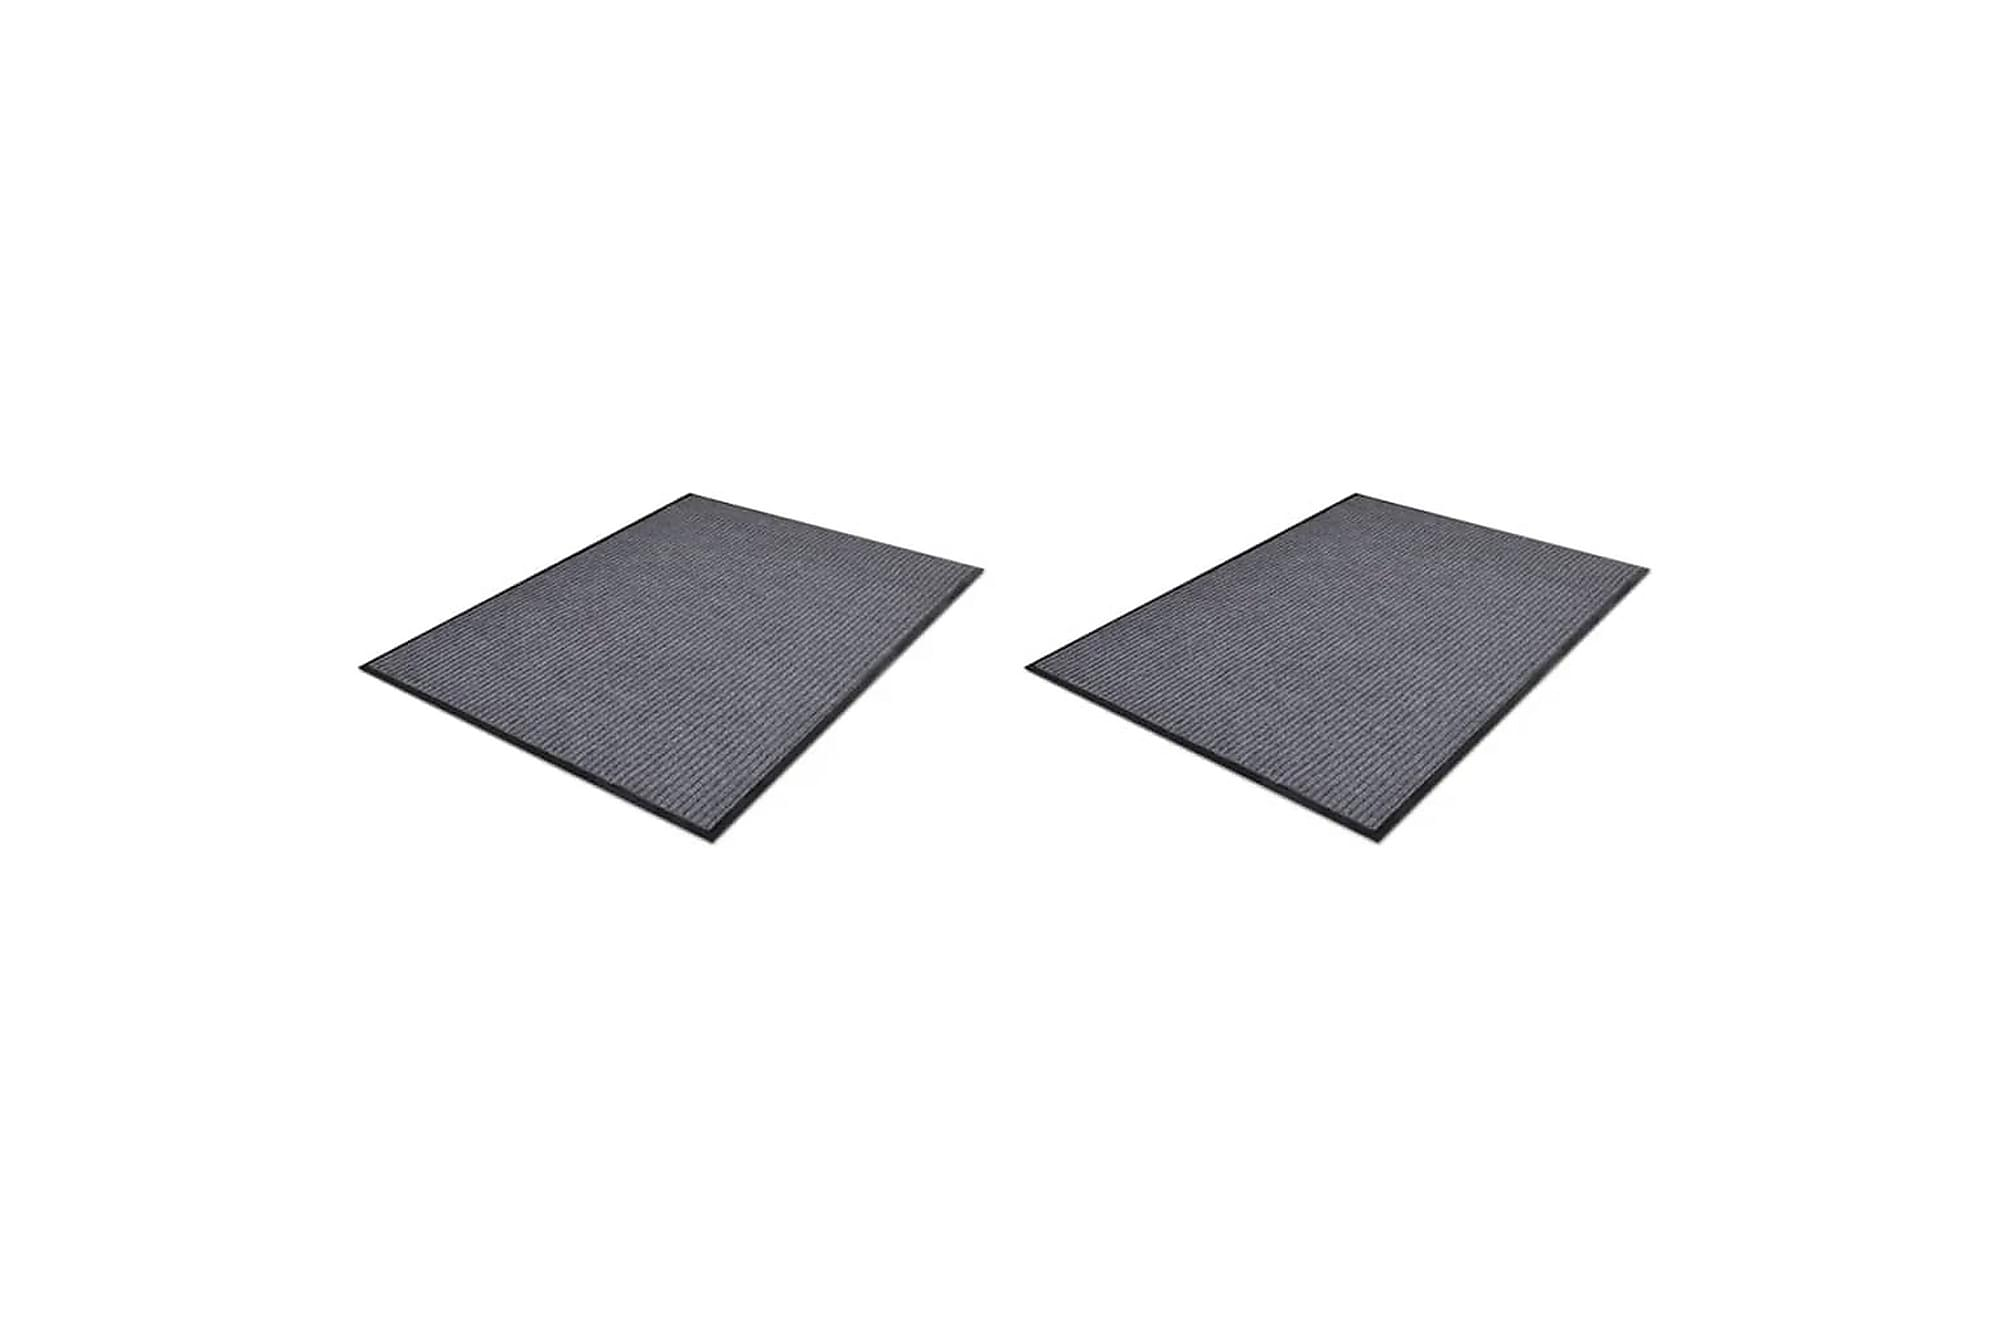 Dörrmatta 2 st PVC grå 90x60 cm, Dörrmattor & entrémattor